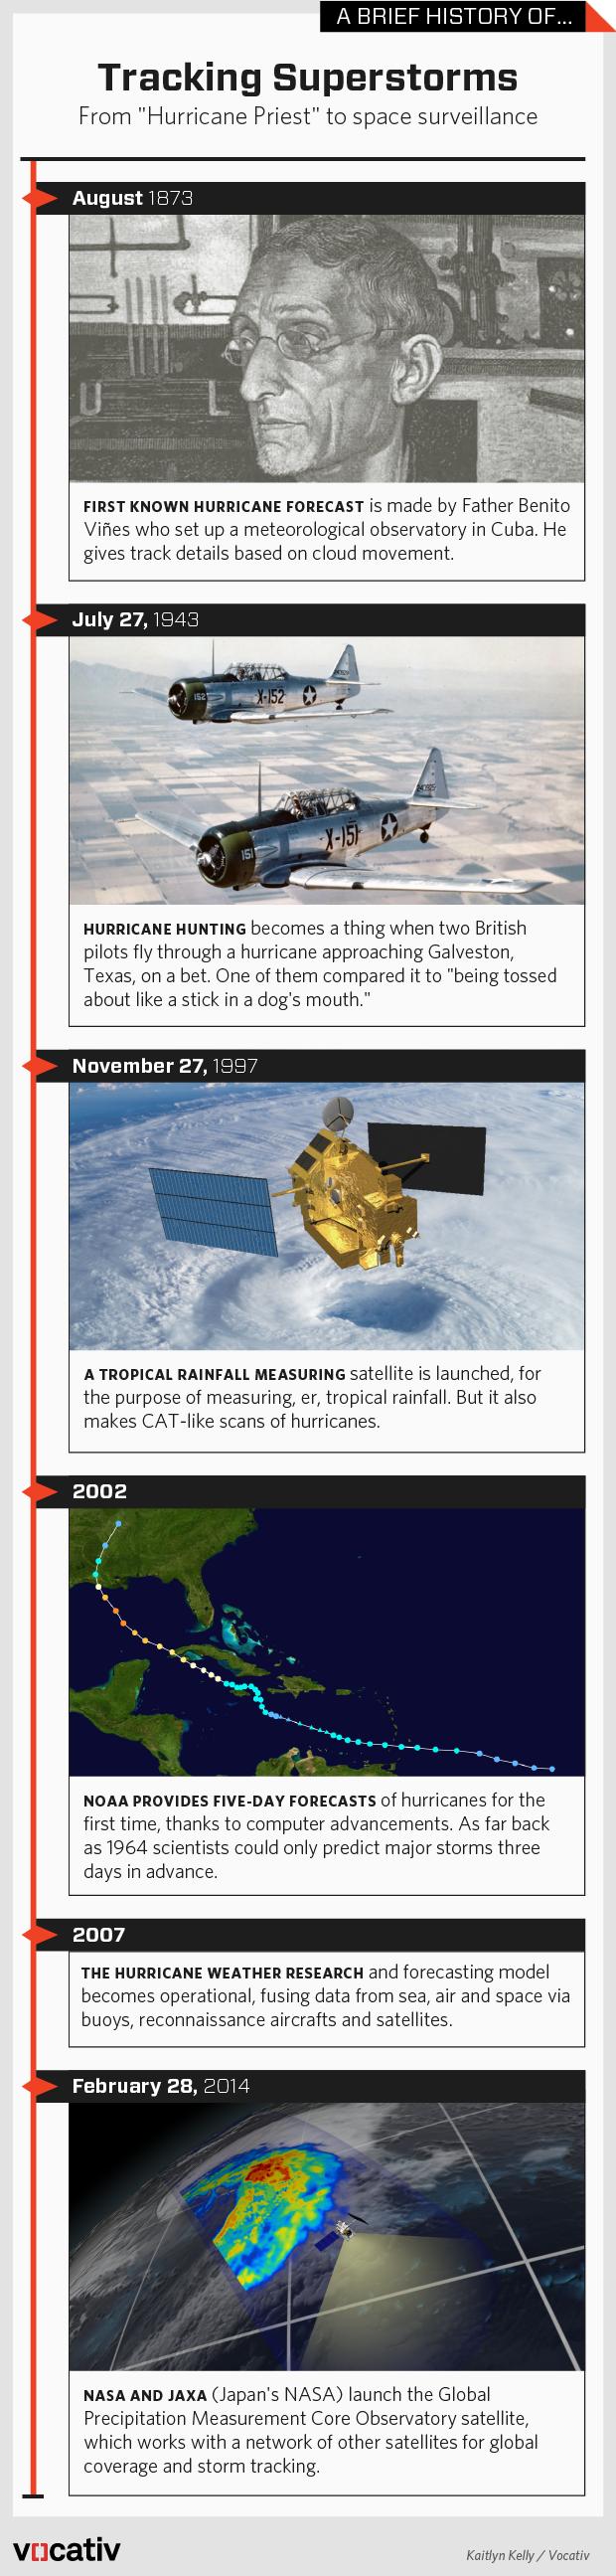 2015_10_1 BHO Hurricanes.r4